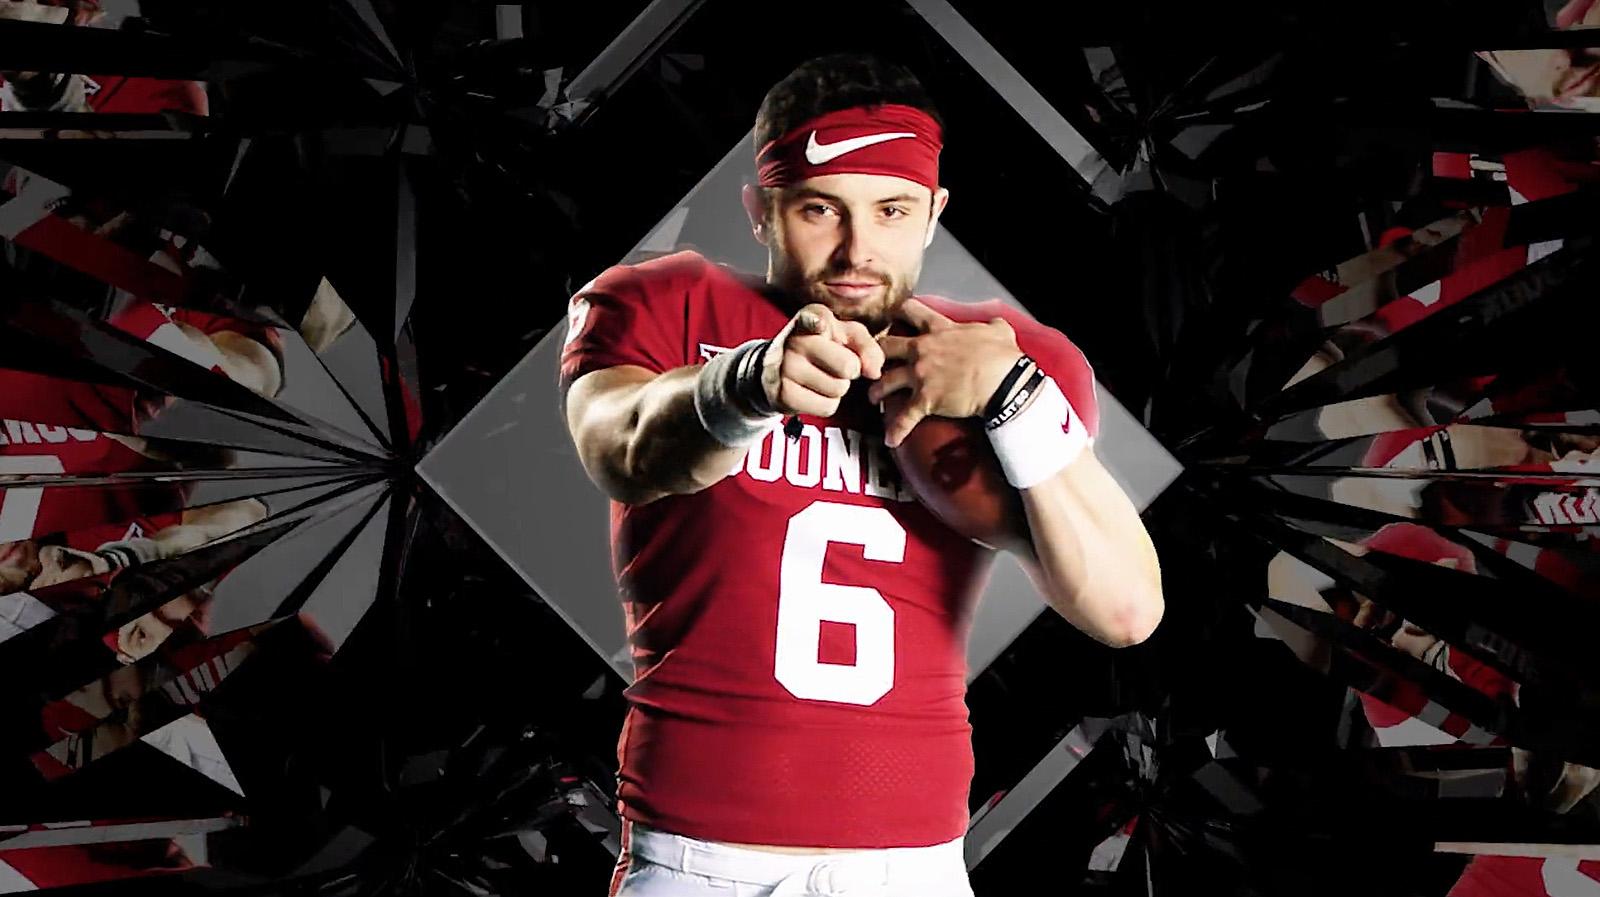 NCS_ESPN-College-Football-Playoffs-Troika_010